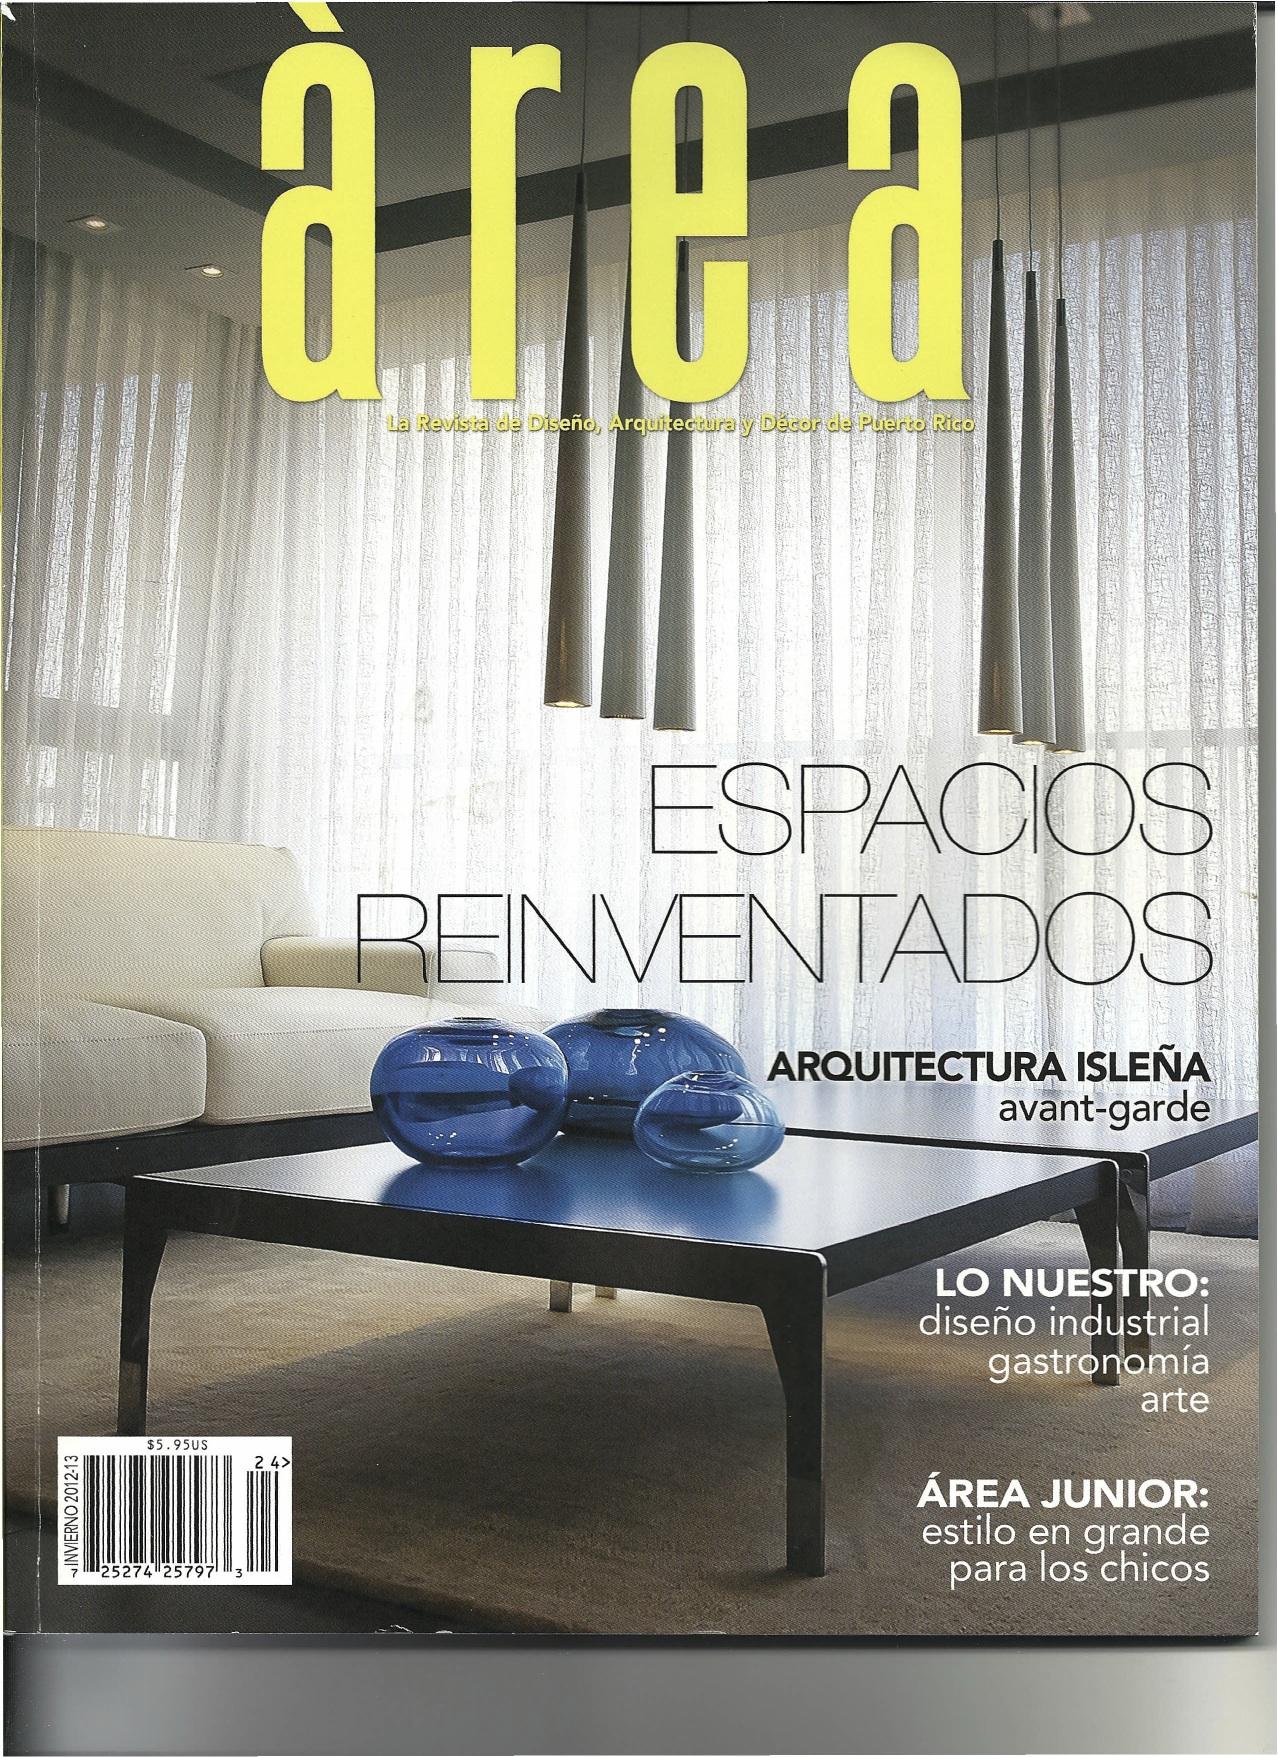 area_yari_cover.jpg